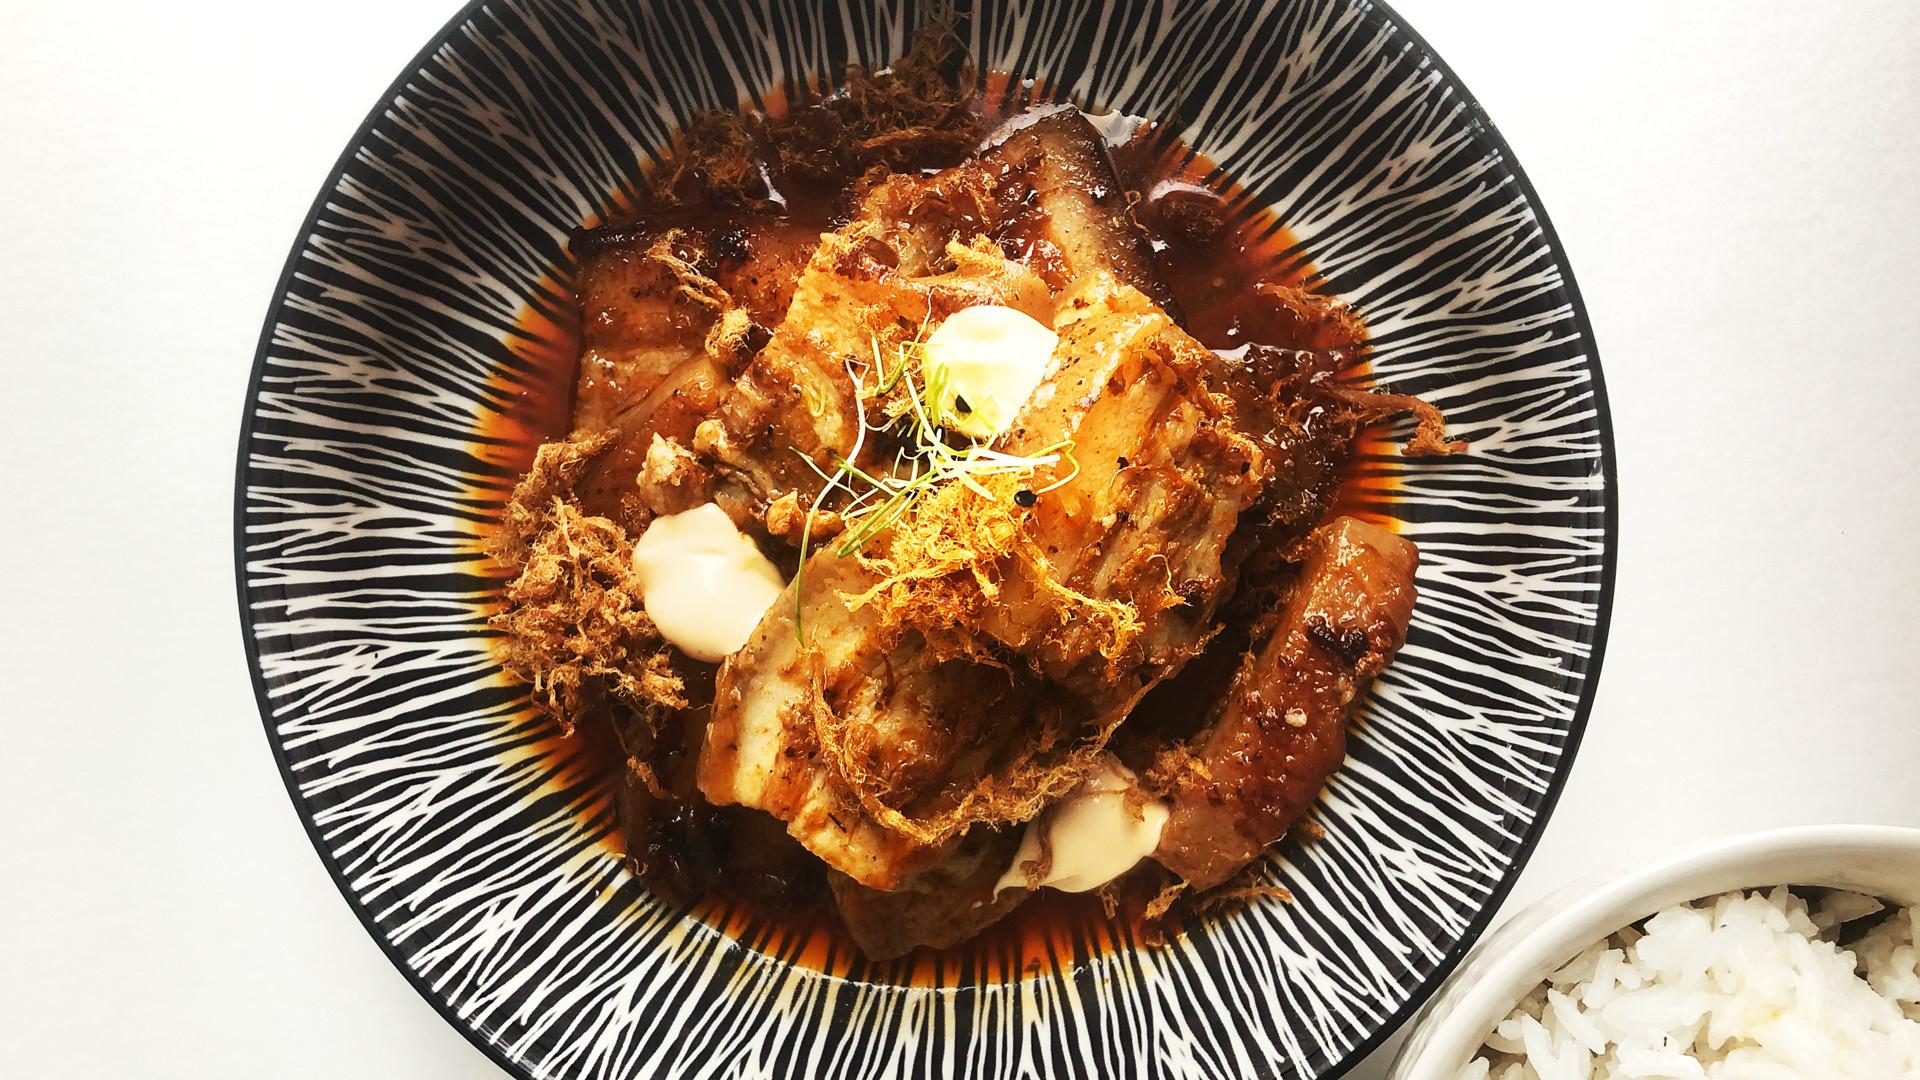 The best new restaurants in Toronto | Pork adobo from Adobar